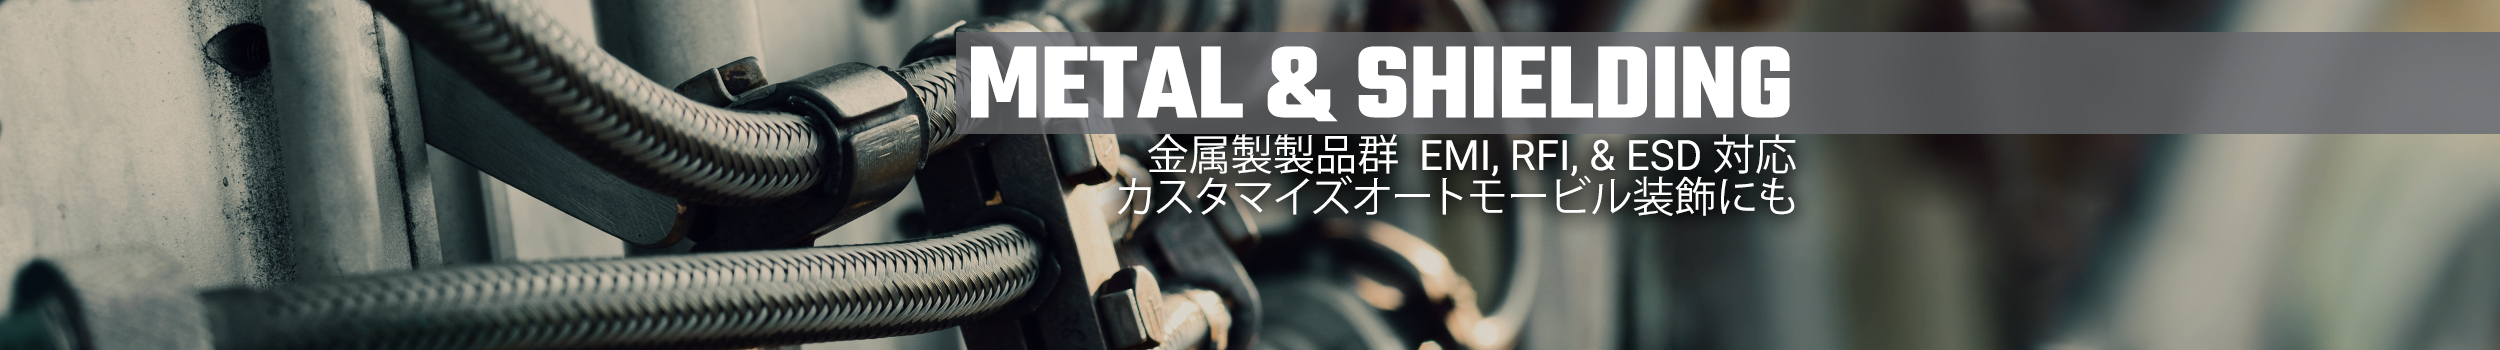 Metal shielding banner jp